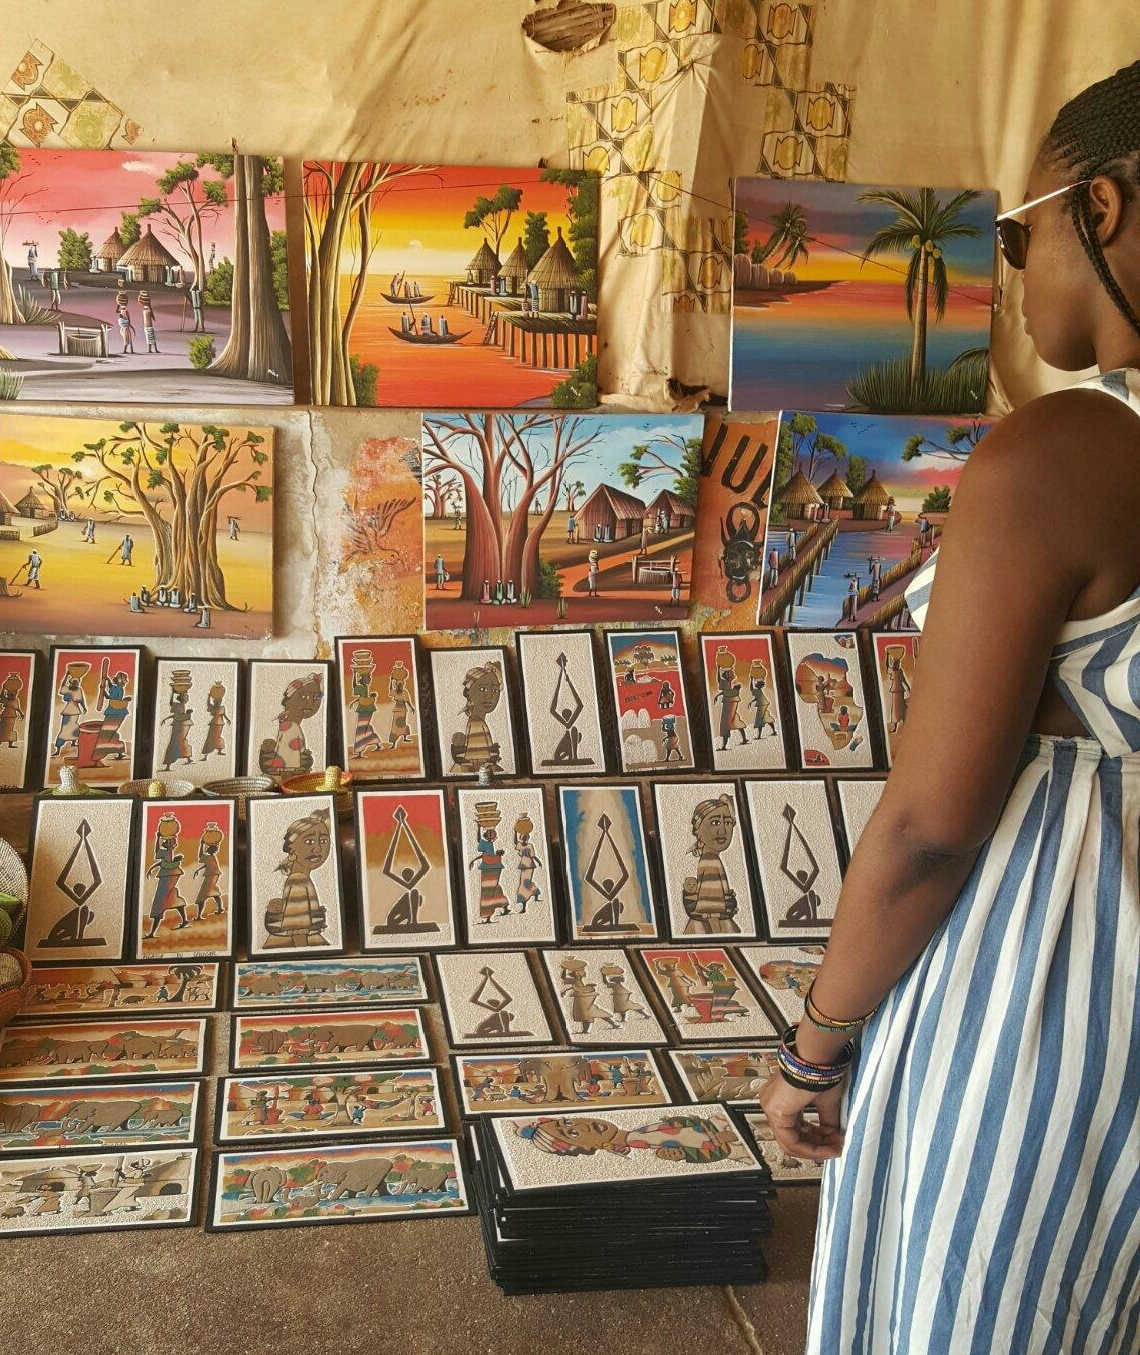 we-sisterhood-dakar-21-lac-rose-retba-femme-noire-art-africain